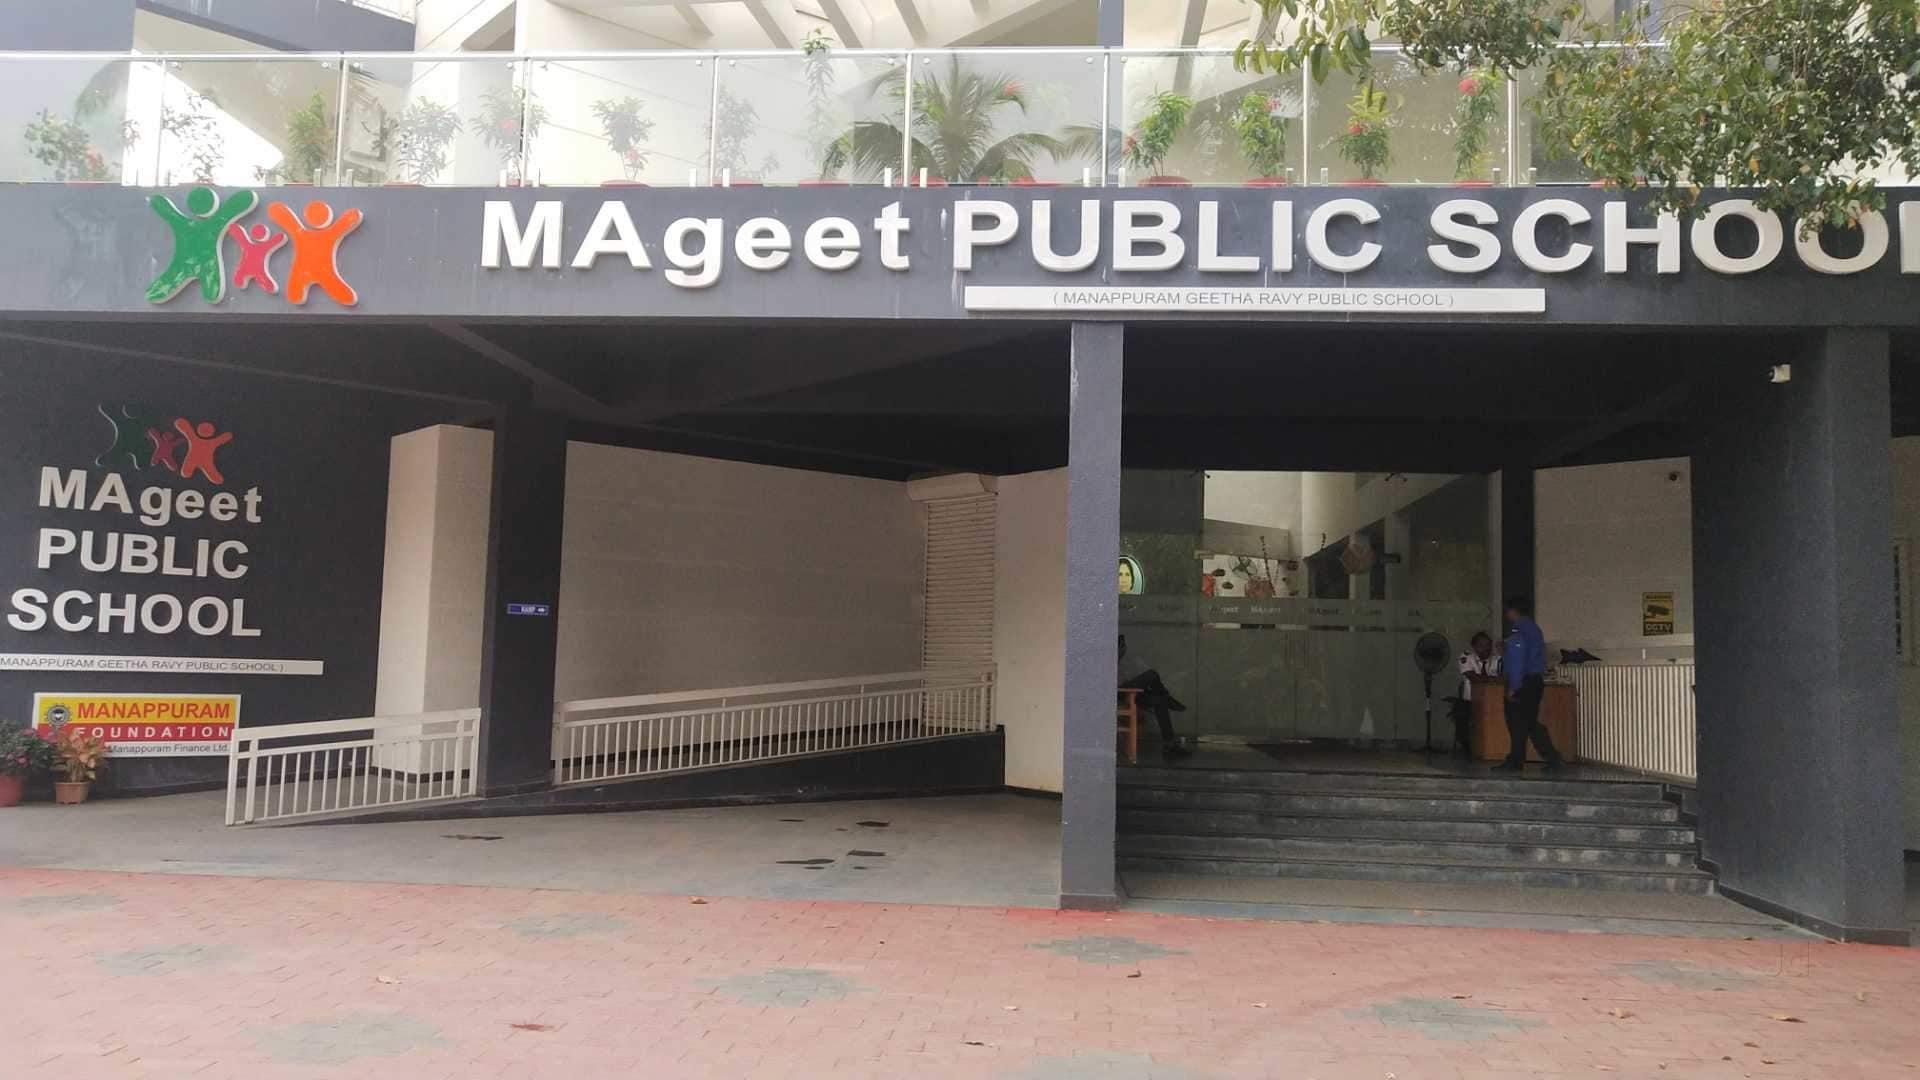 manappuram geetha ravy public school in valapad thrissur justdial manappuram geetha ravy public school in